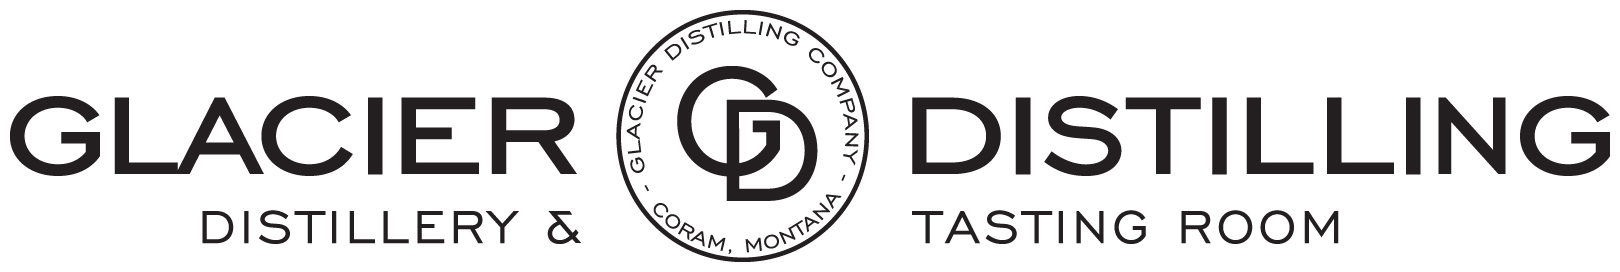 gd logo 2016 primary.jpg